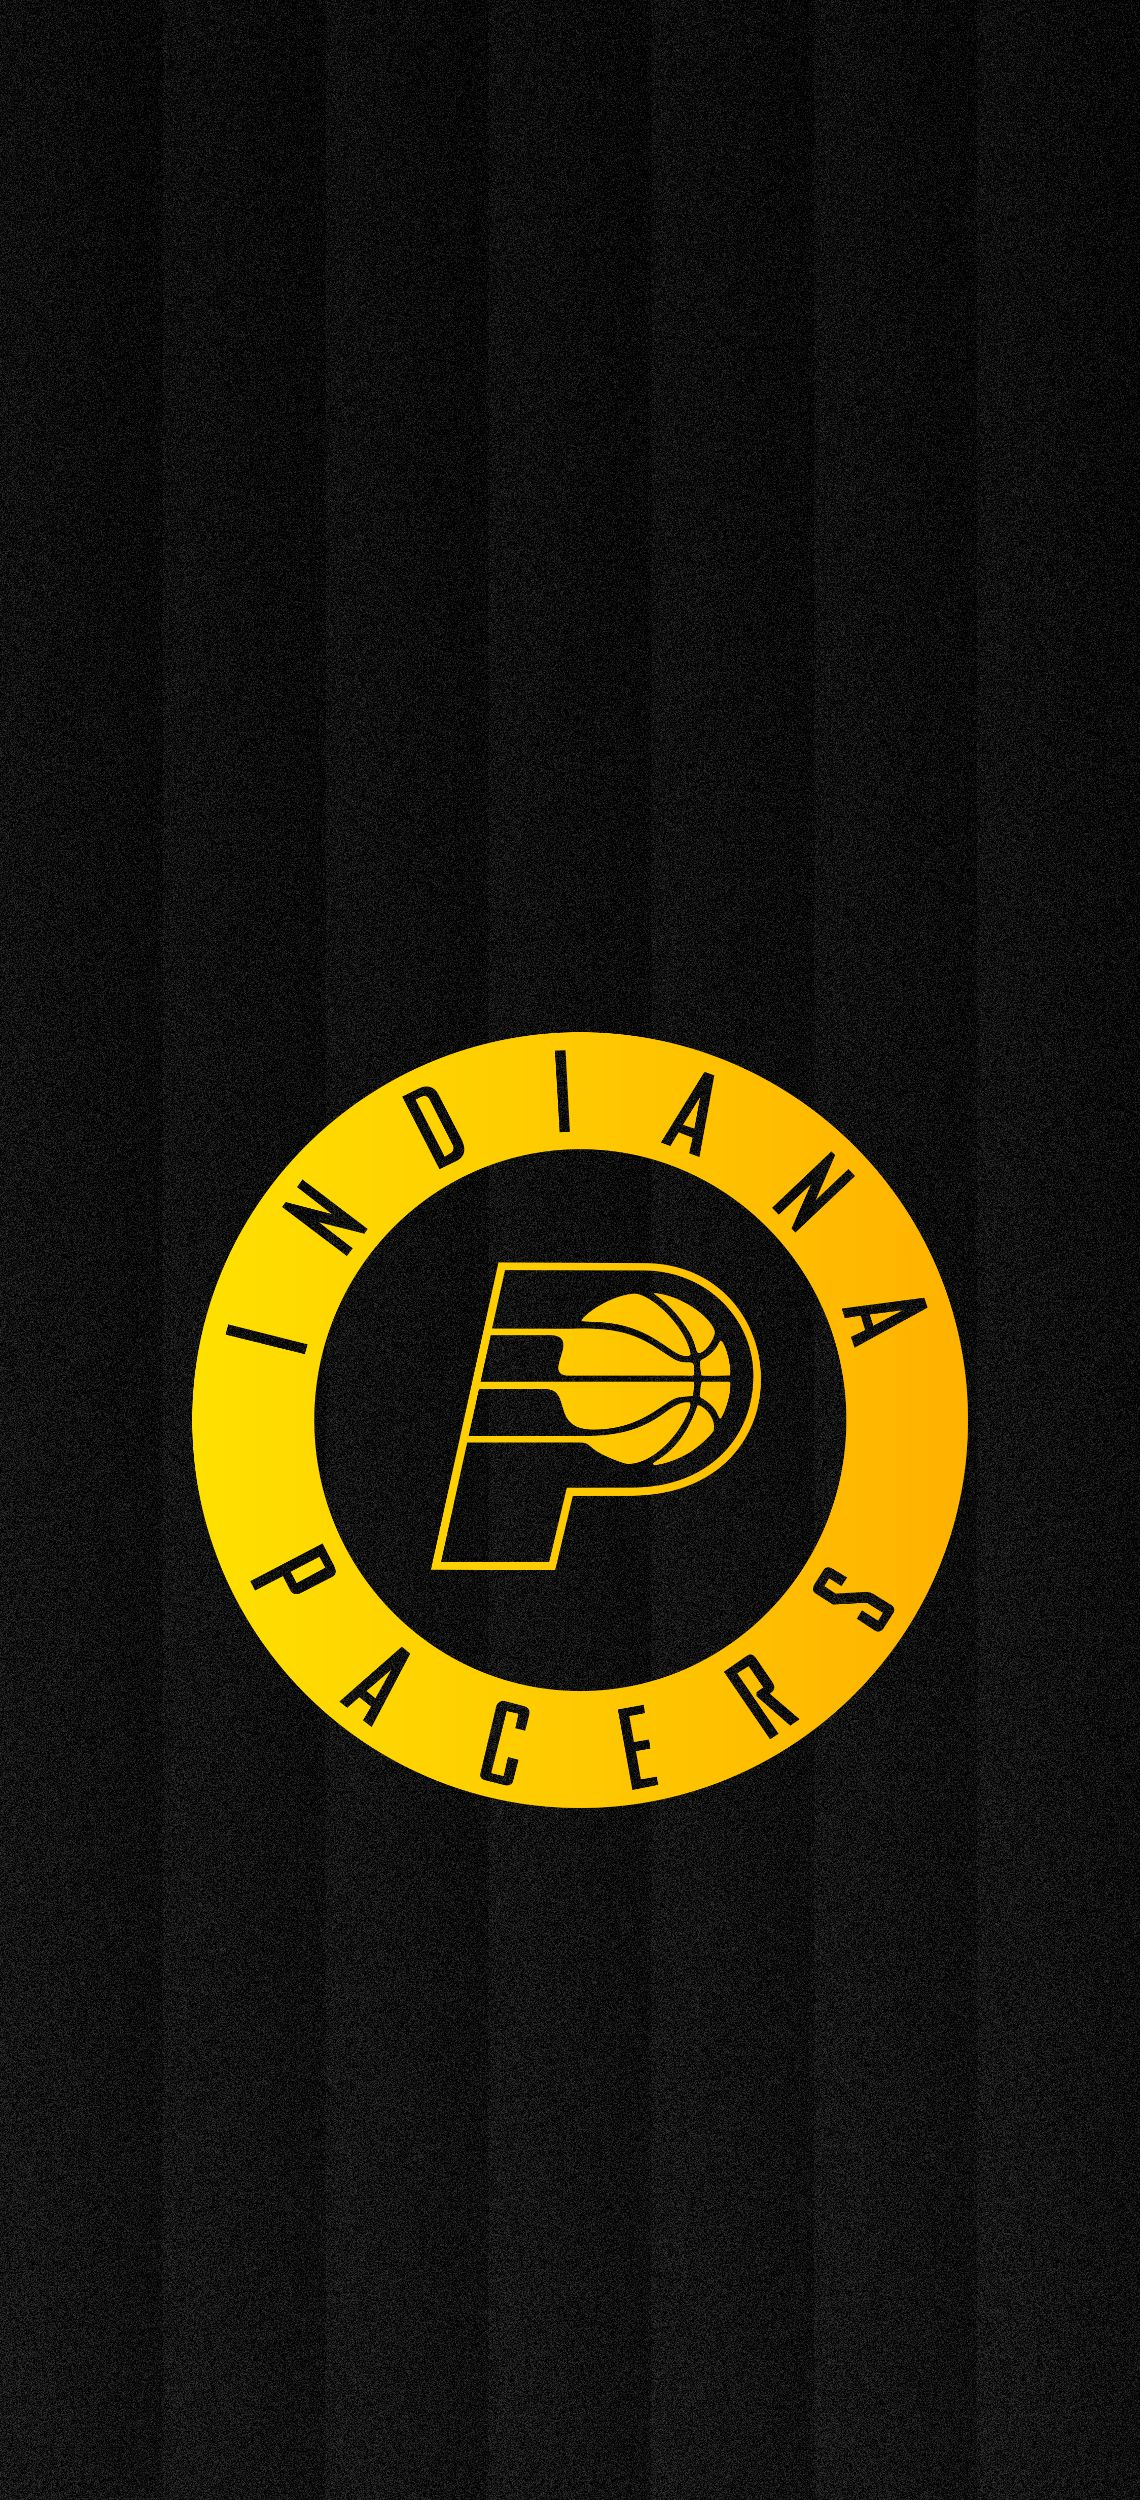 Indiana Pacers Gradient Wallpaper Nba Basketball Teams Indiana Pacers Nba